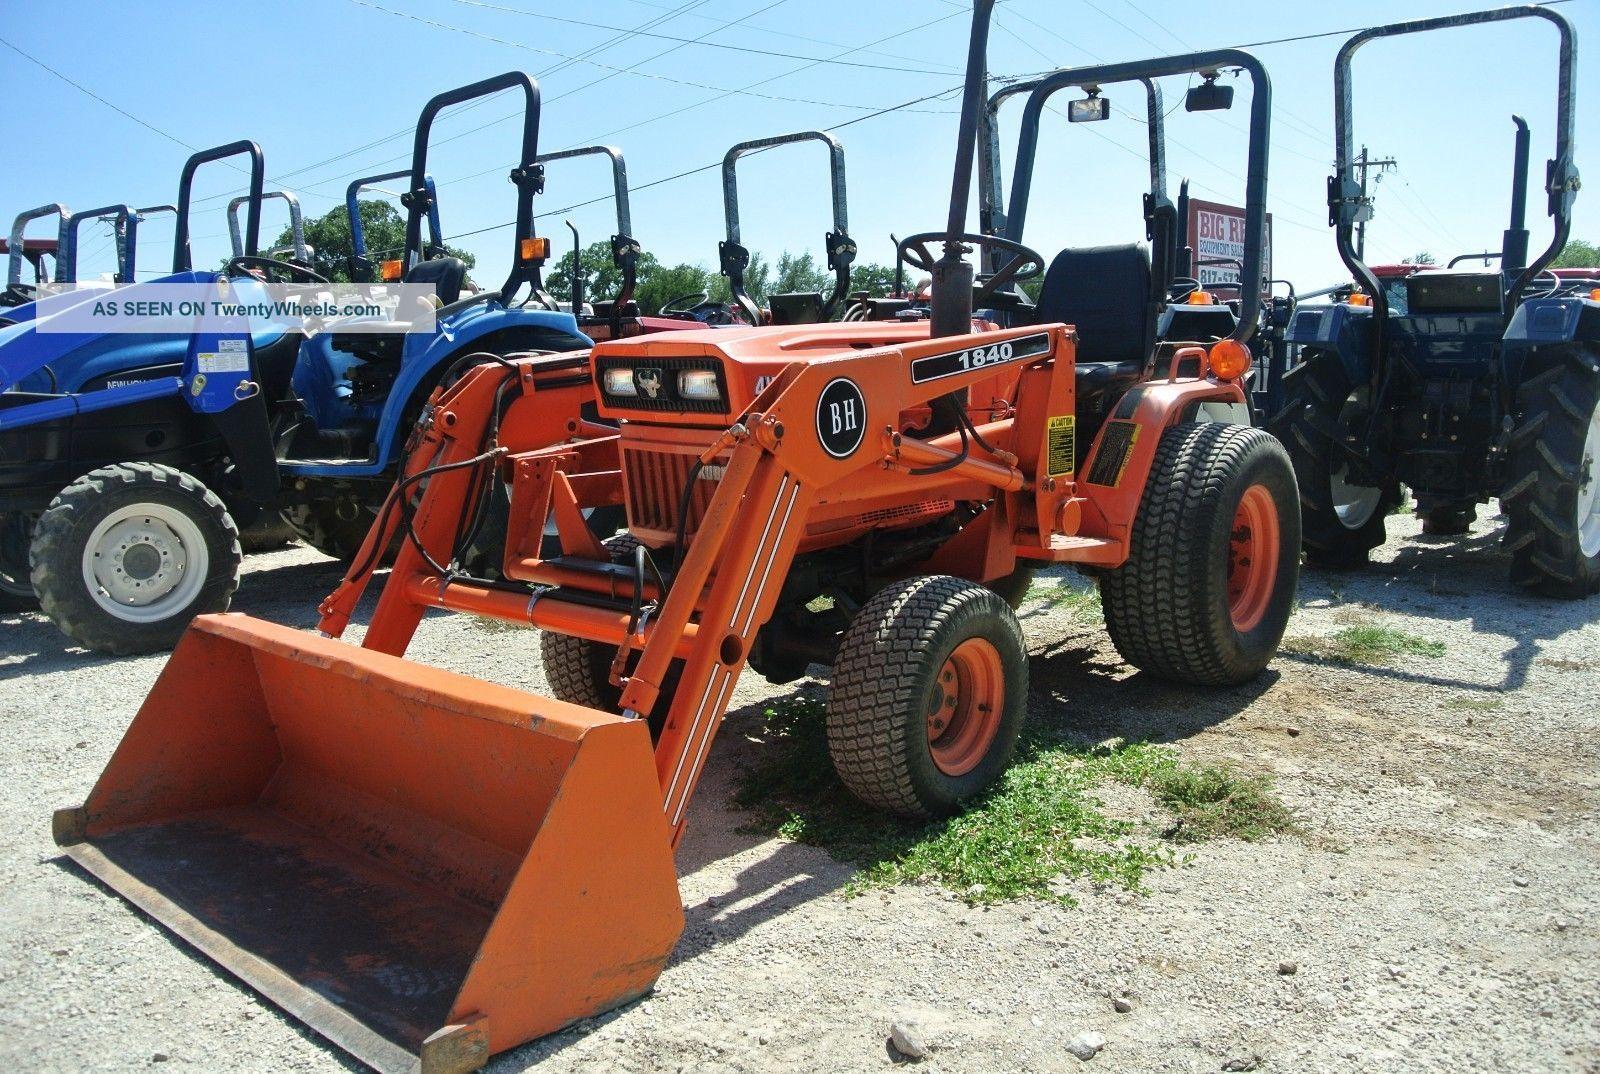 17hp 4wd Kubota B7200 Tractor W/ Loader Bucket Turf Tires Farm Equipment  Diesel